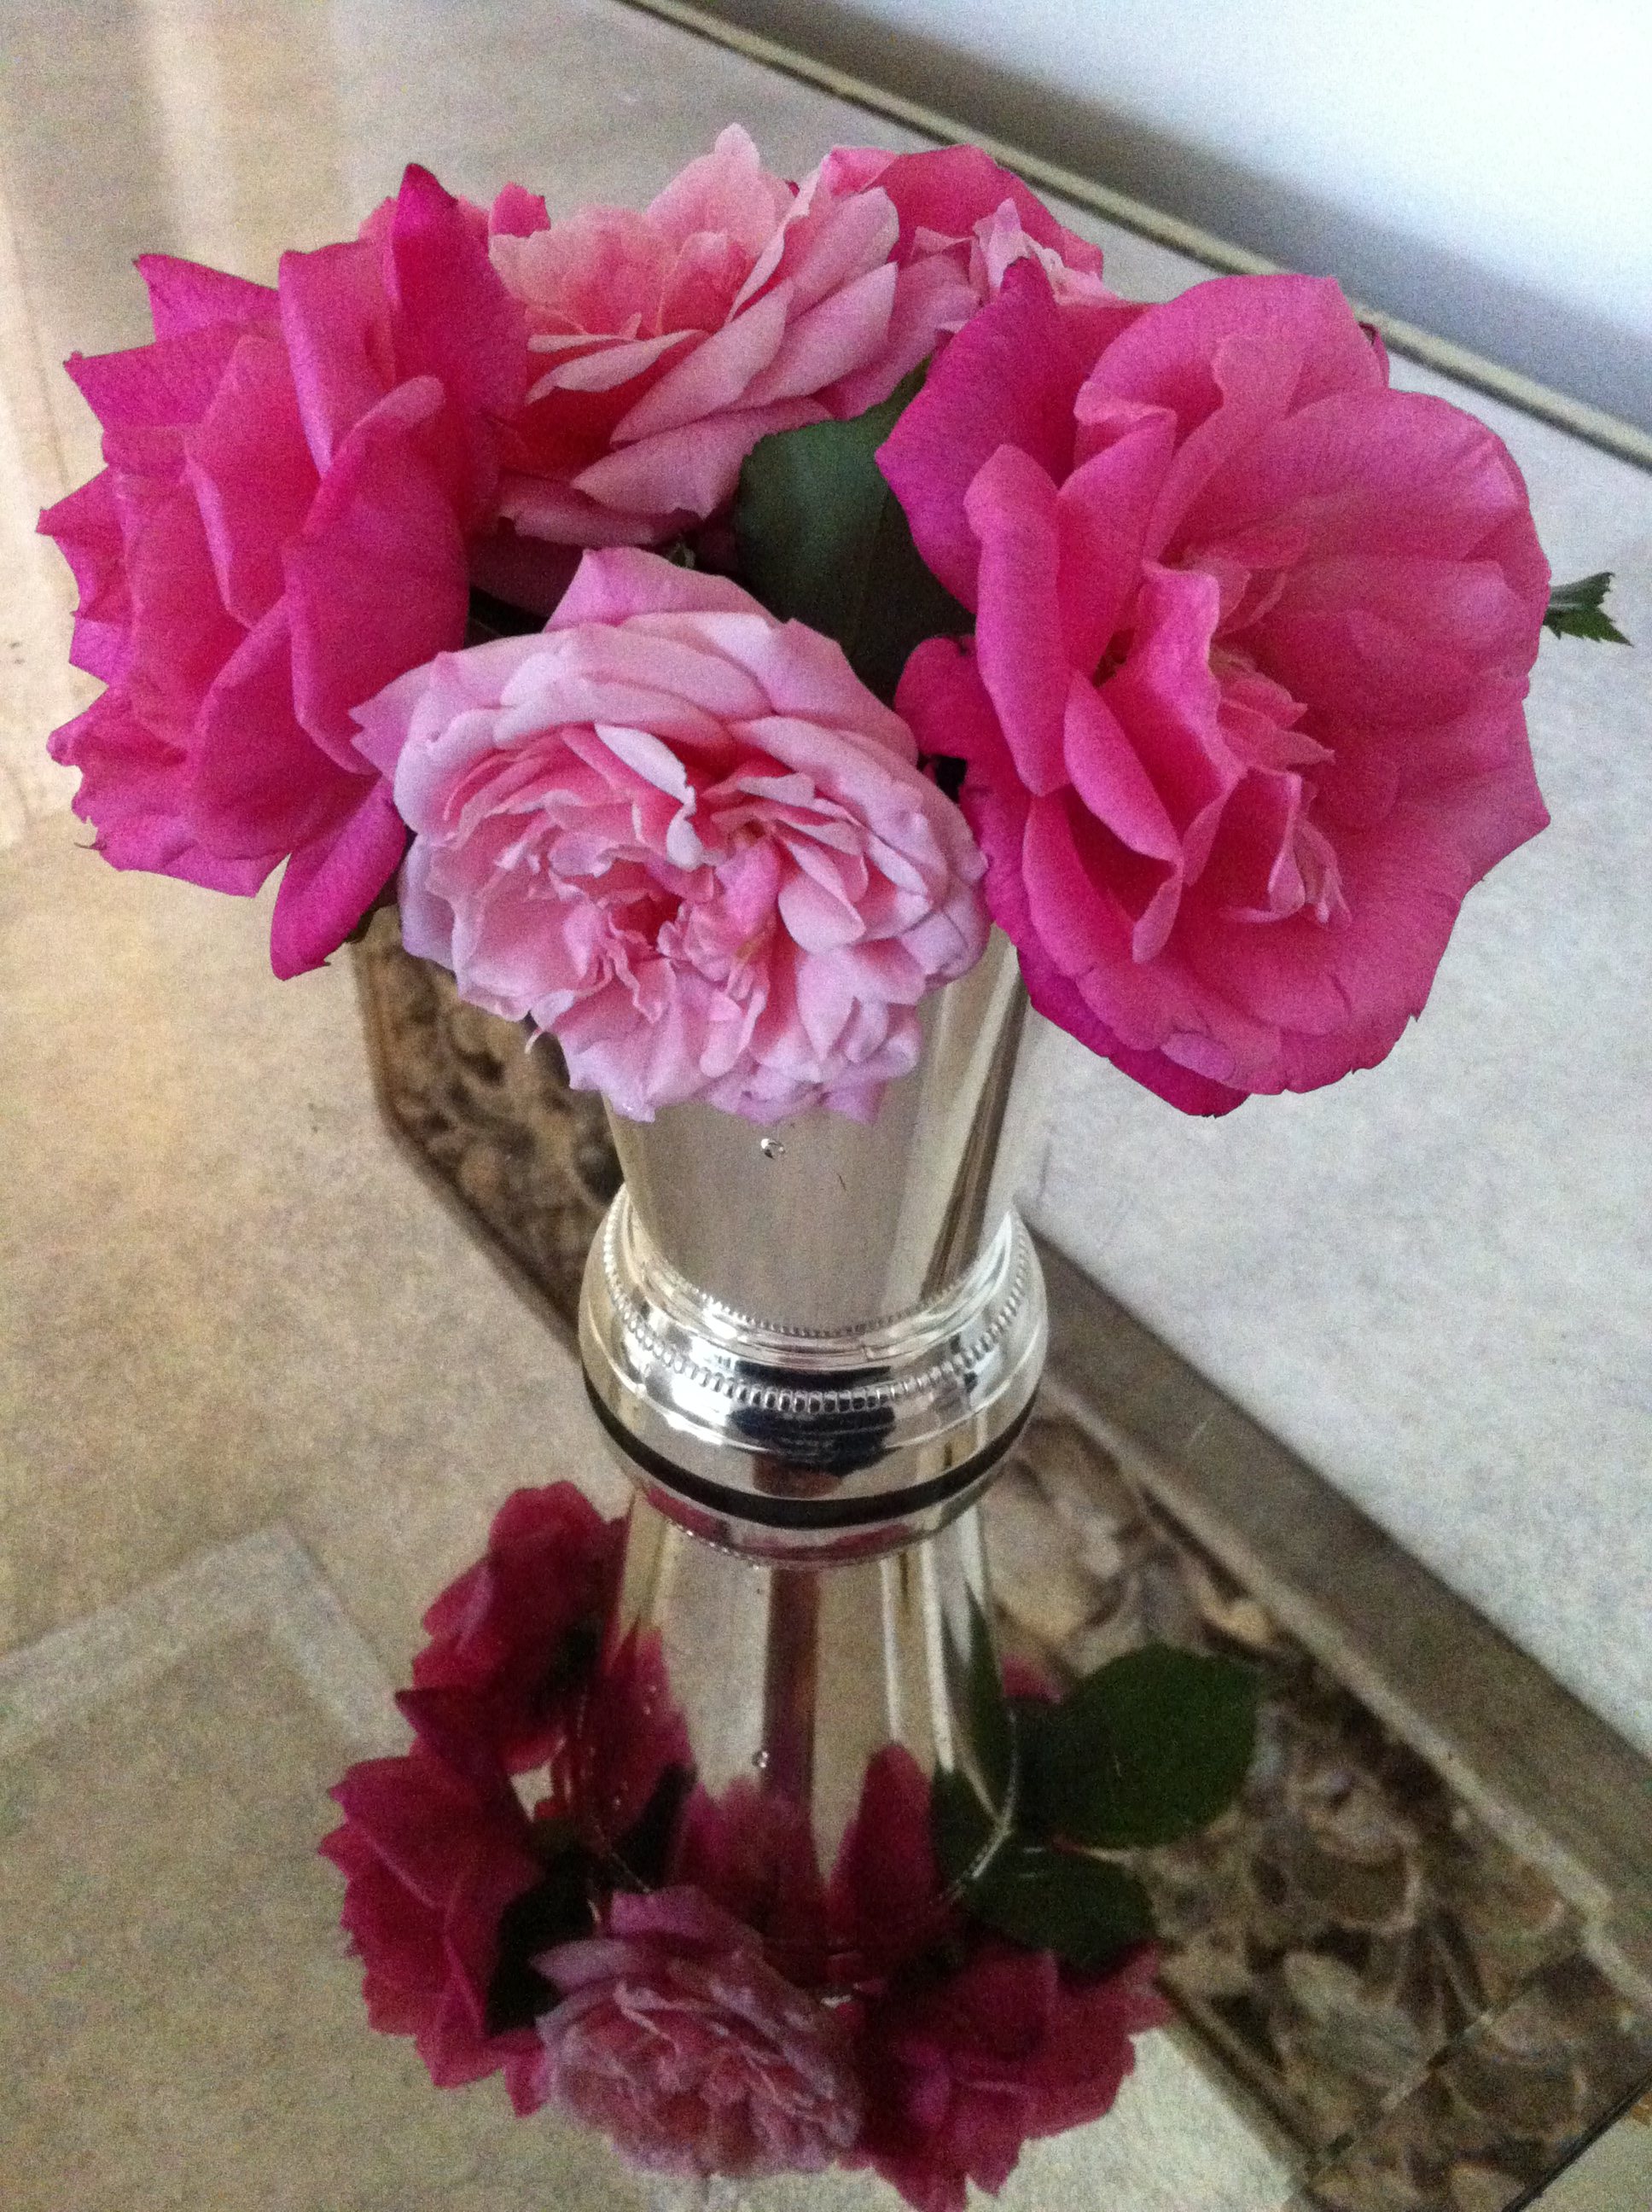 Neighbor's Flowers 01